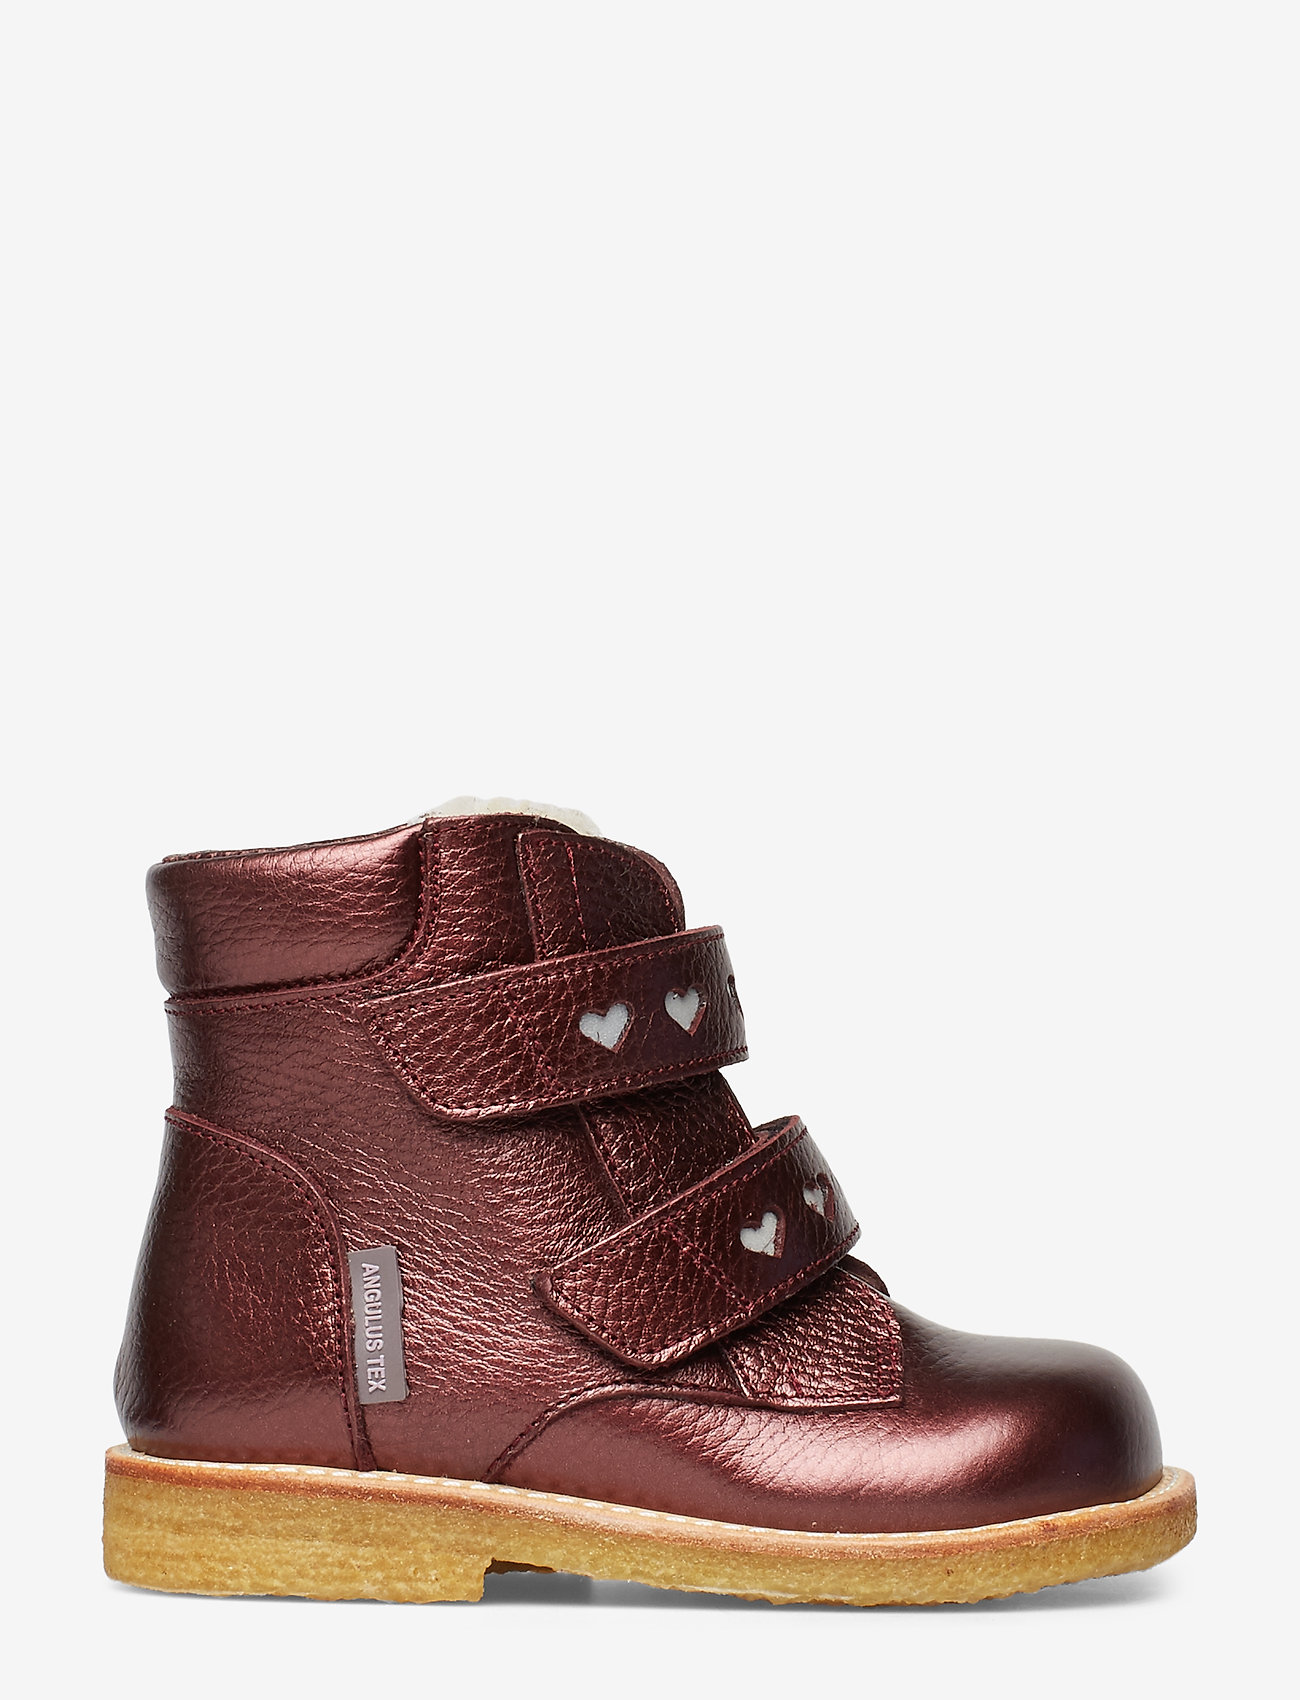 ANGULUS - Boots - flat - with velcro - lära-gå-skor - 1536/2012 bordeaux shine - 1